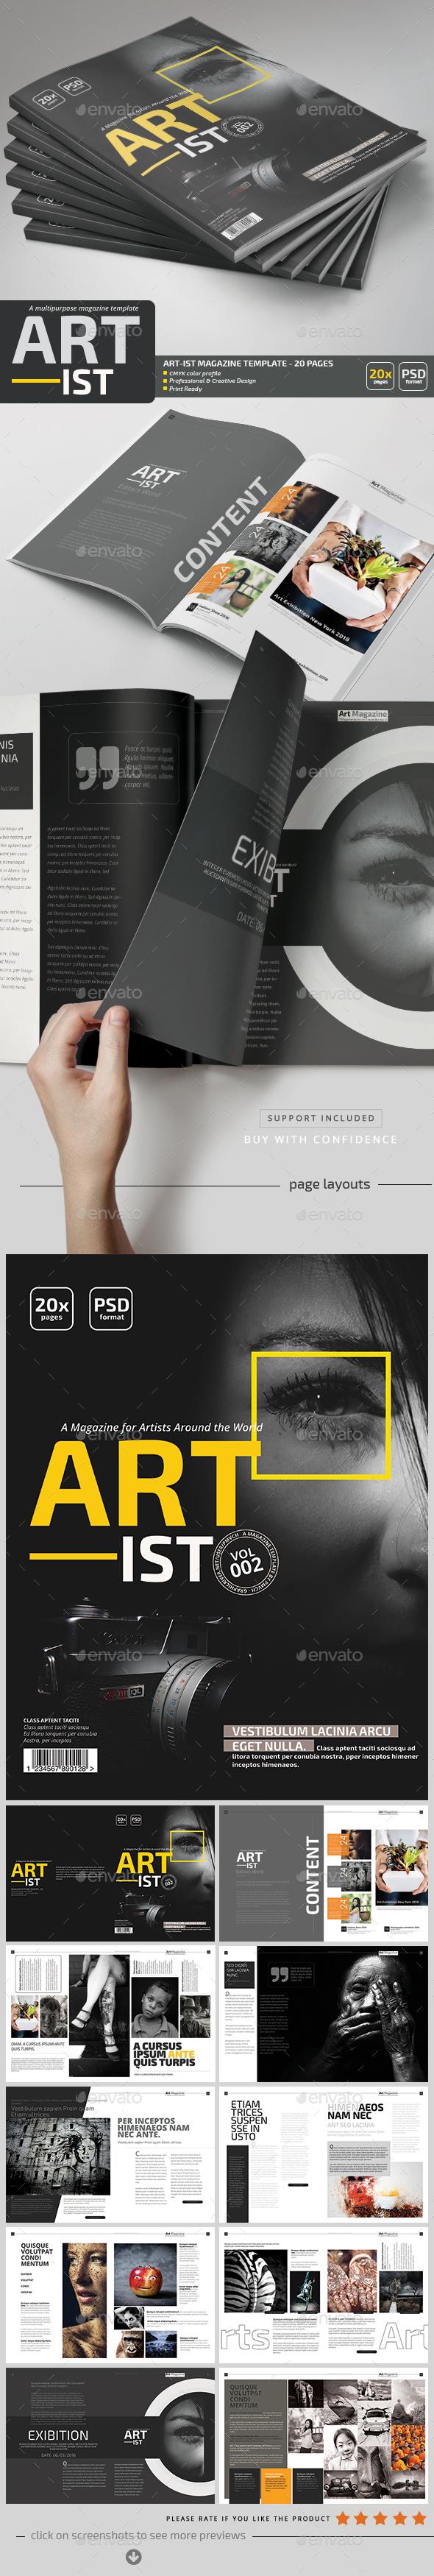 Art-ist Magazine Template V.2 - Magazines Print Templates